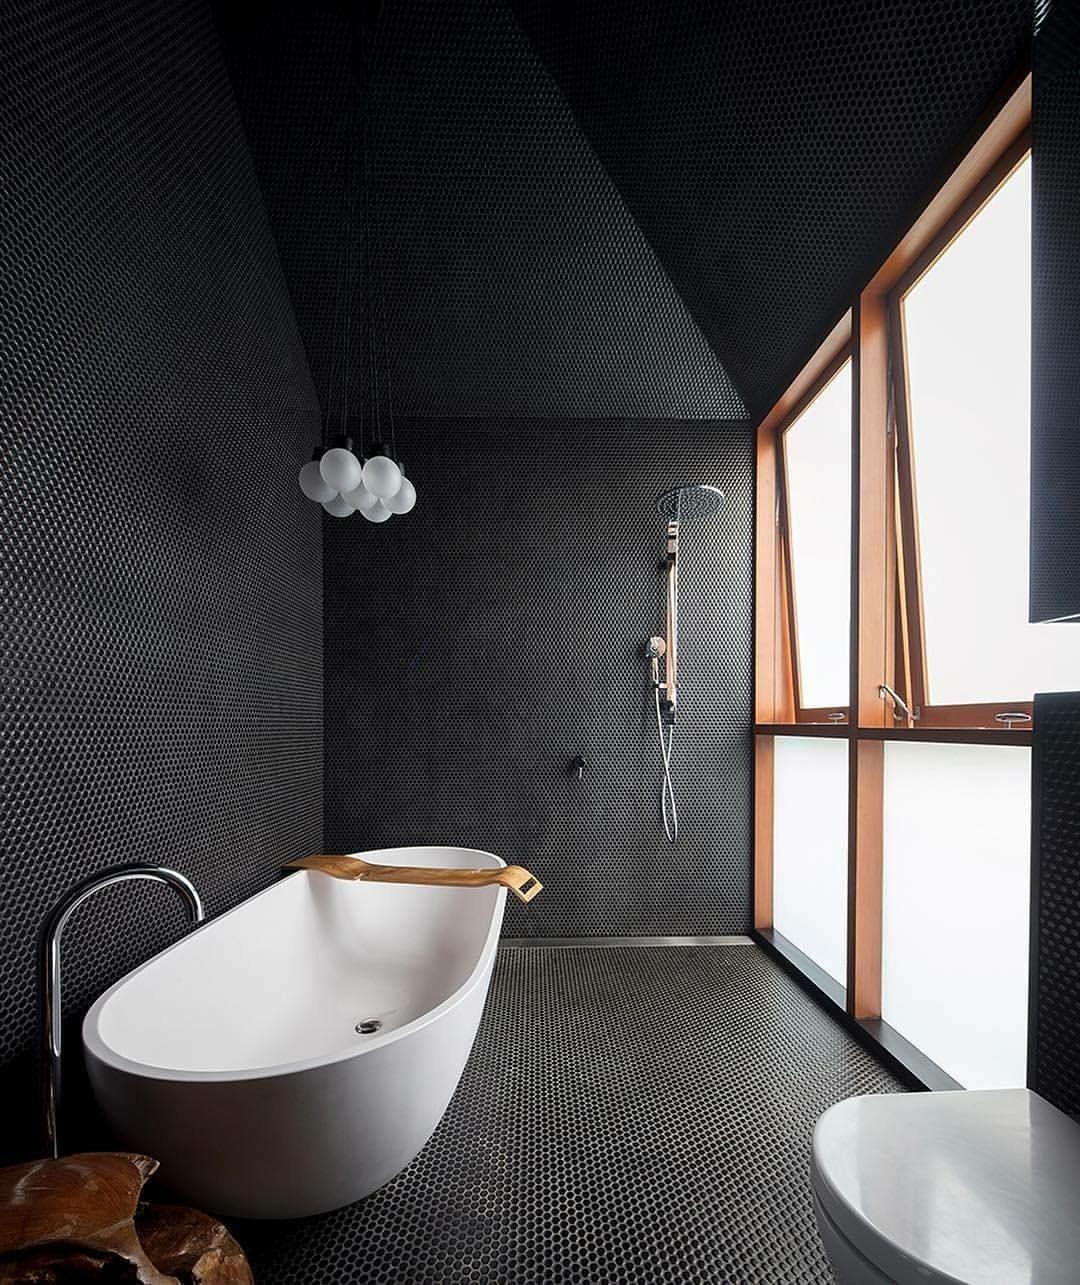 Best Black and White Interior Design Ideas